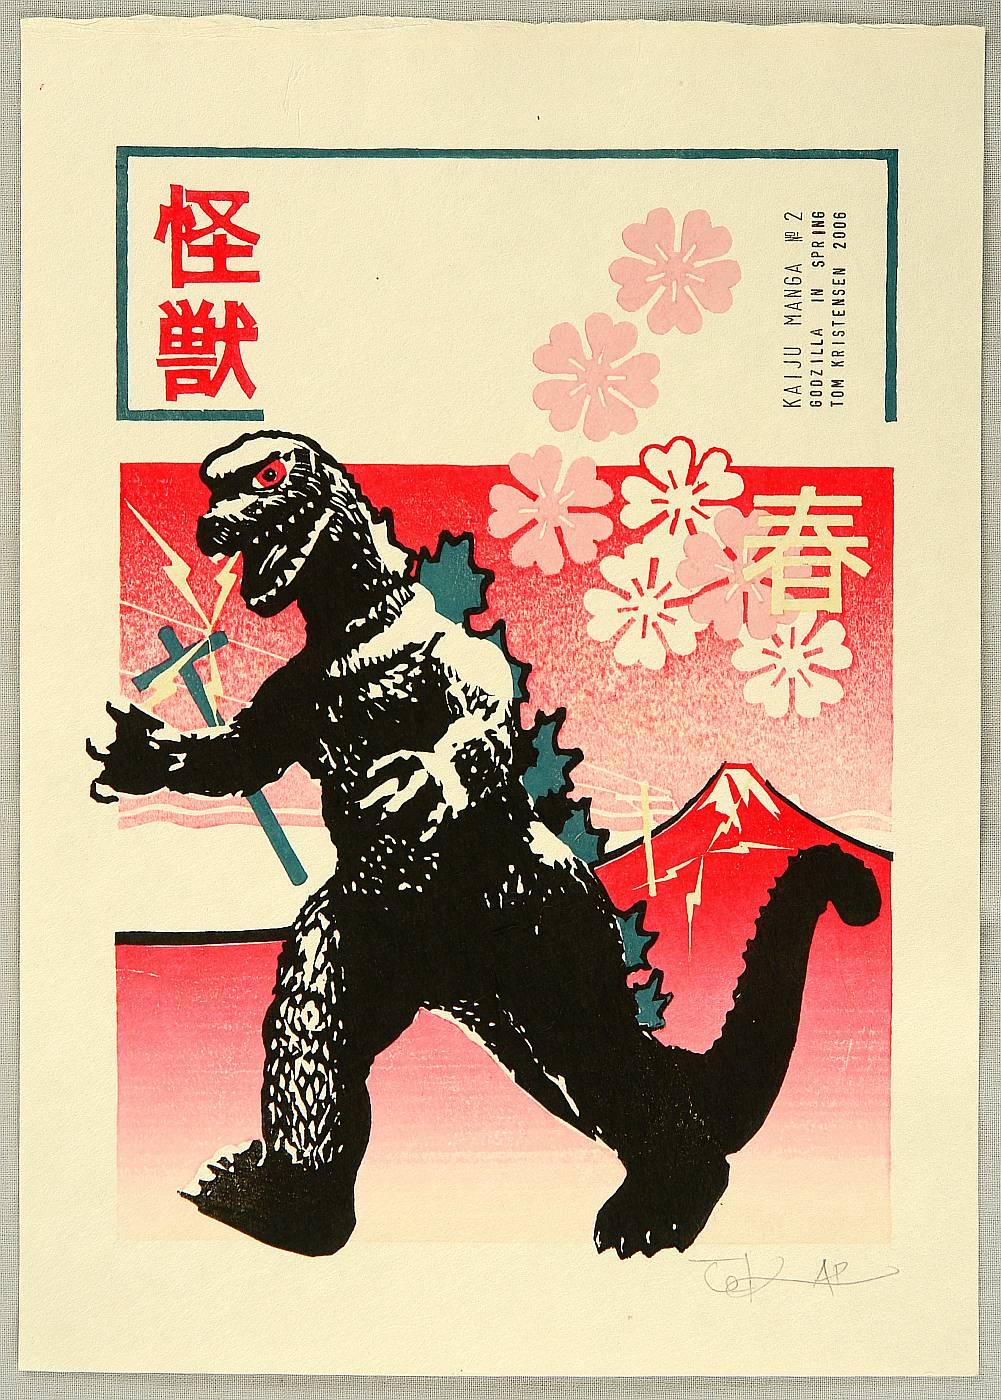 2 godzilla in spring - Godzilla Pictures To Print